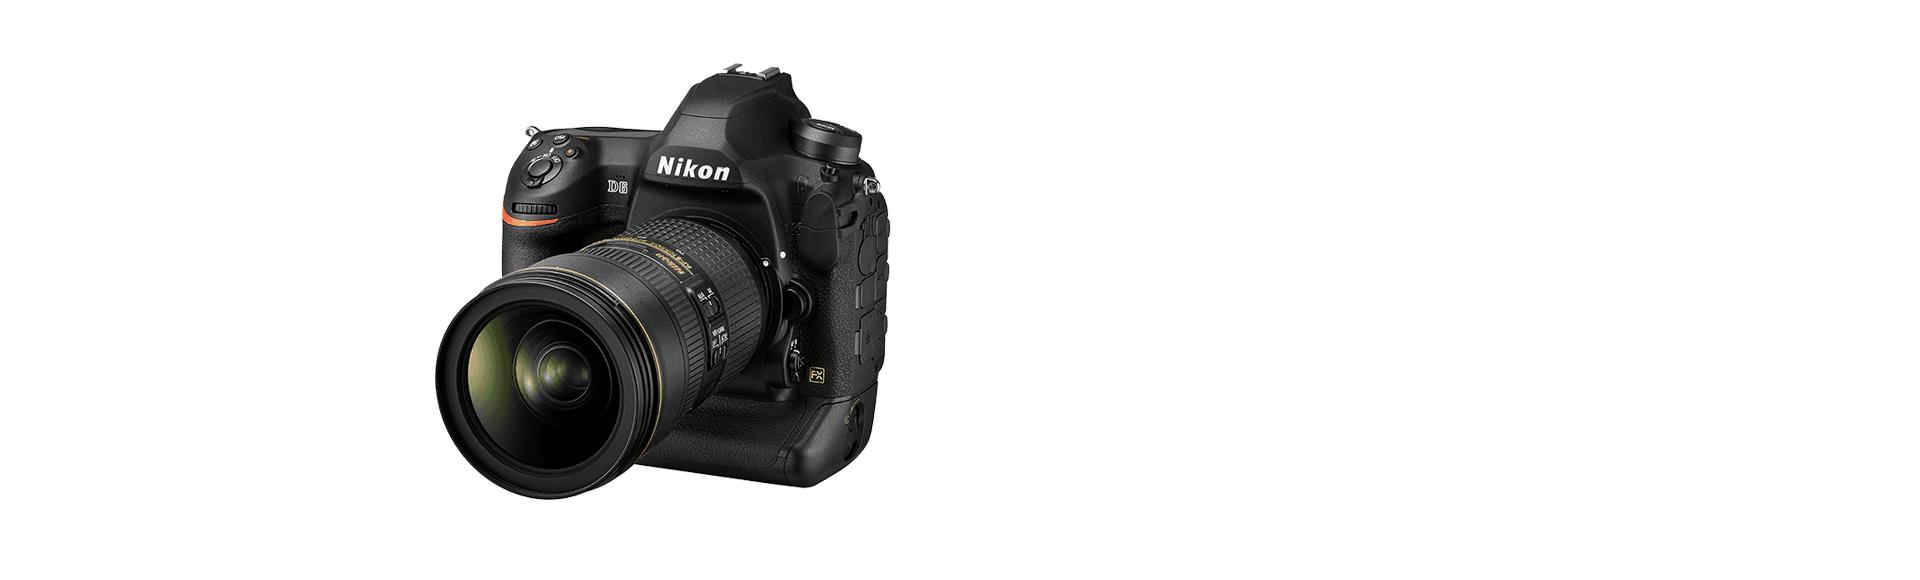 New Nikon D6